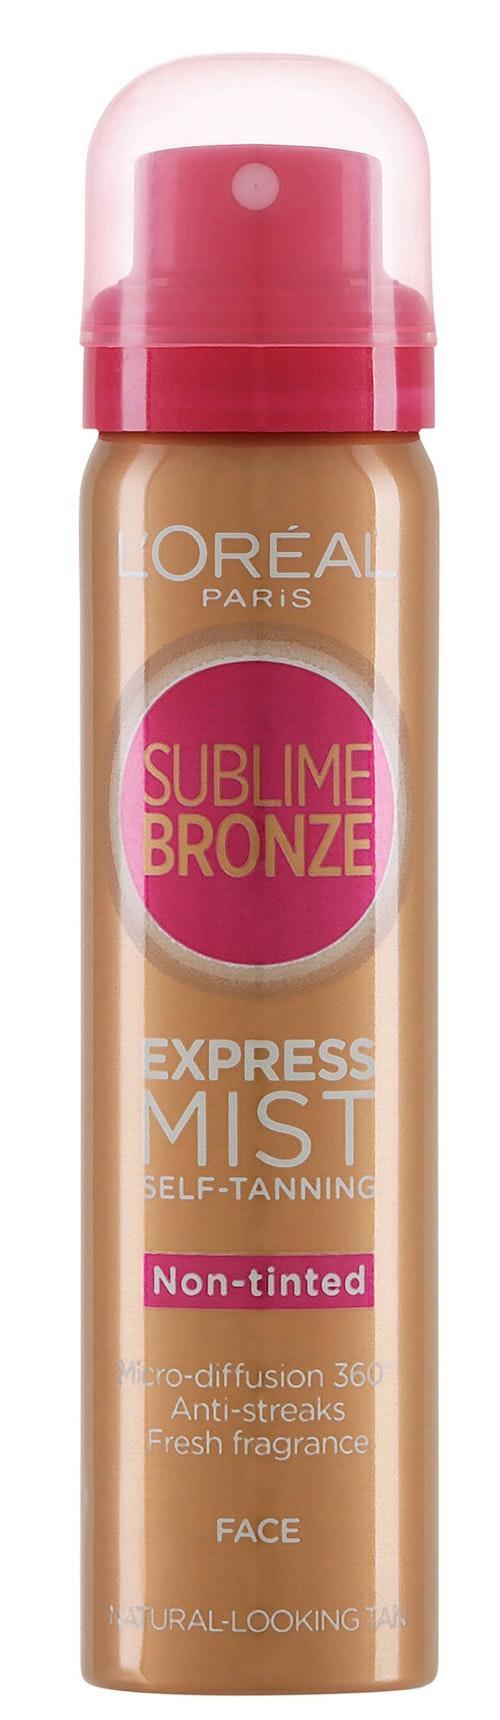 L'Oreal Sublime Bronze Self-Tan Express ProFace 75 ml